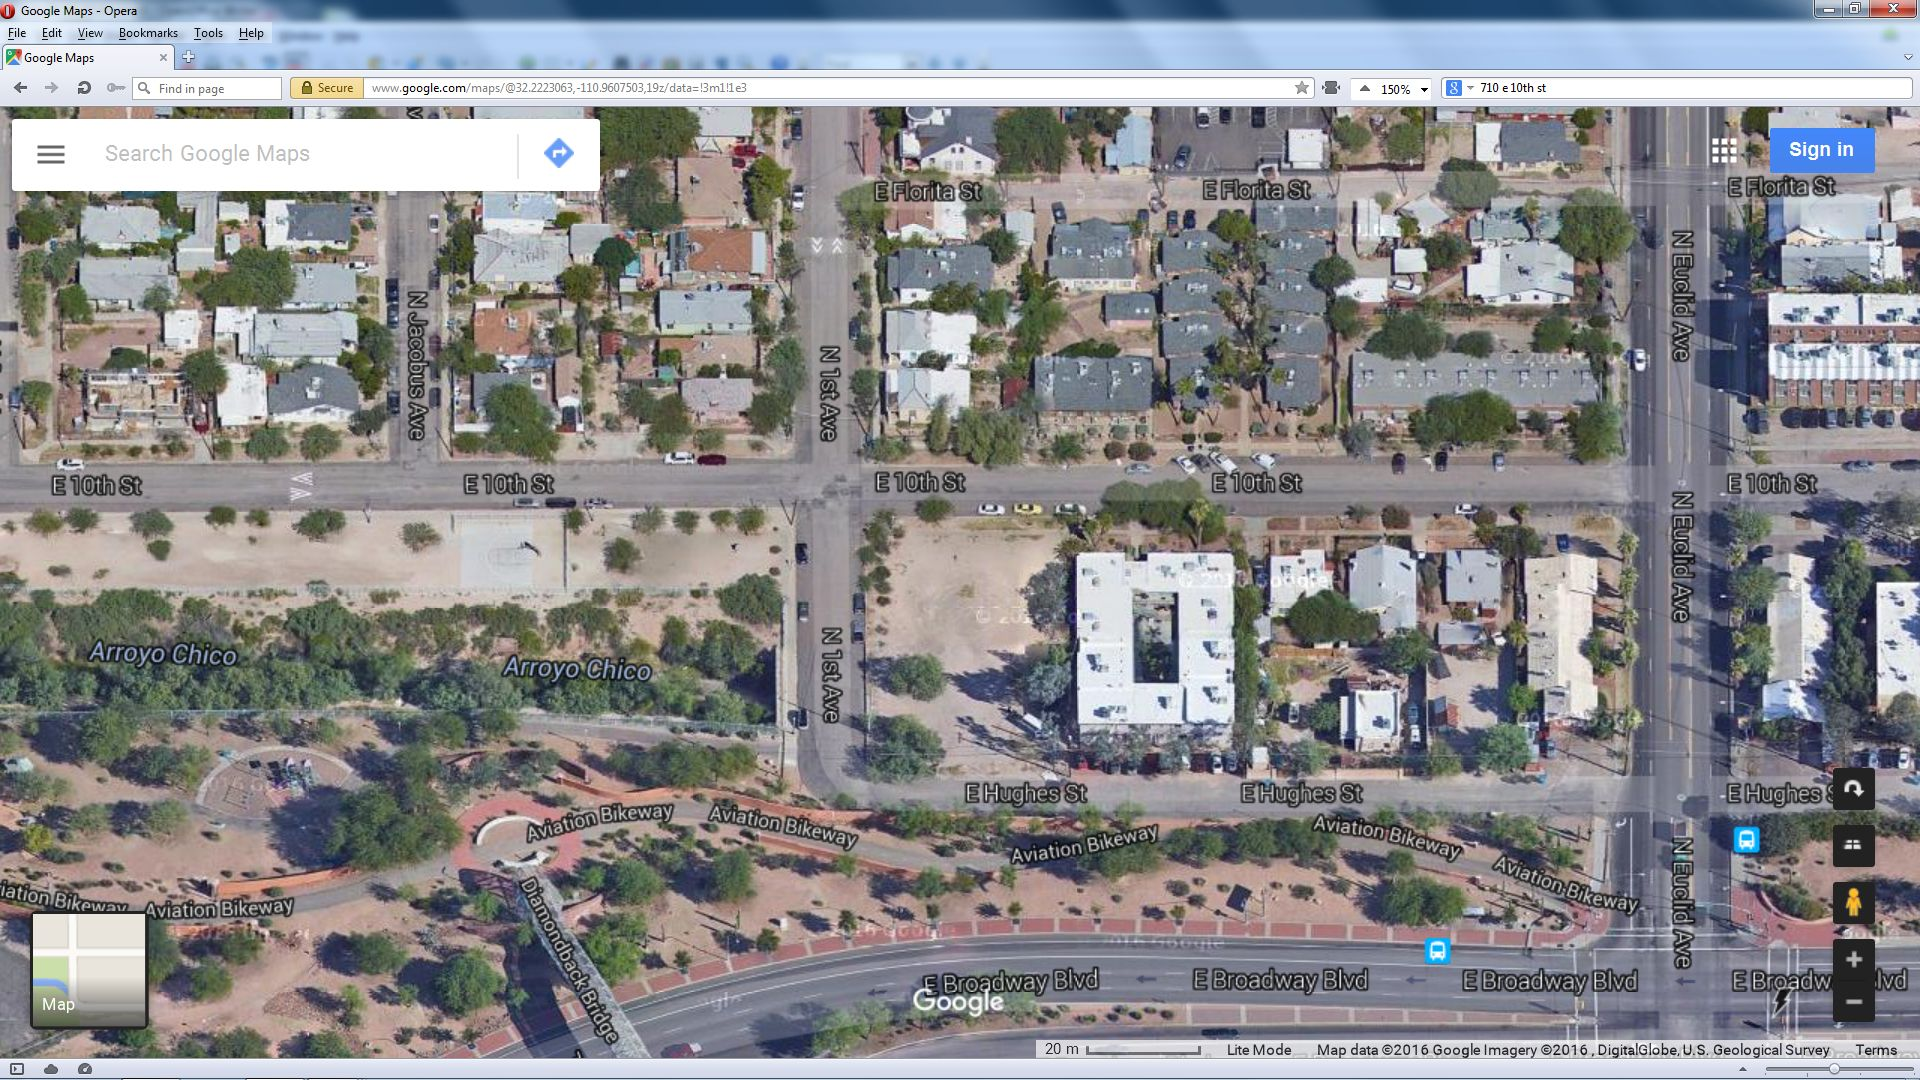 Map Of United States Showing Arizona%0A     E   th St For Sale Tucson AZ Trulia ISyn qf  ius                             E   th St Tucson AZ        Google Maps Tucson Google Maps Tucson